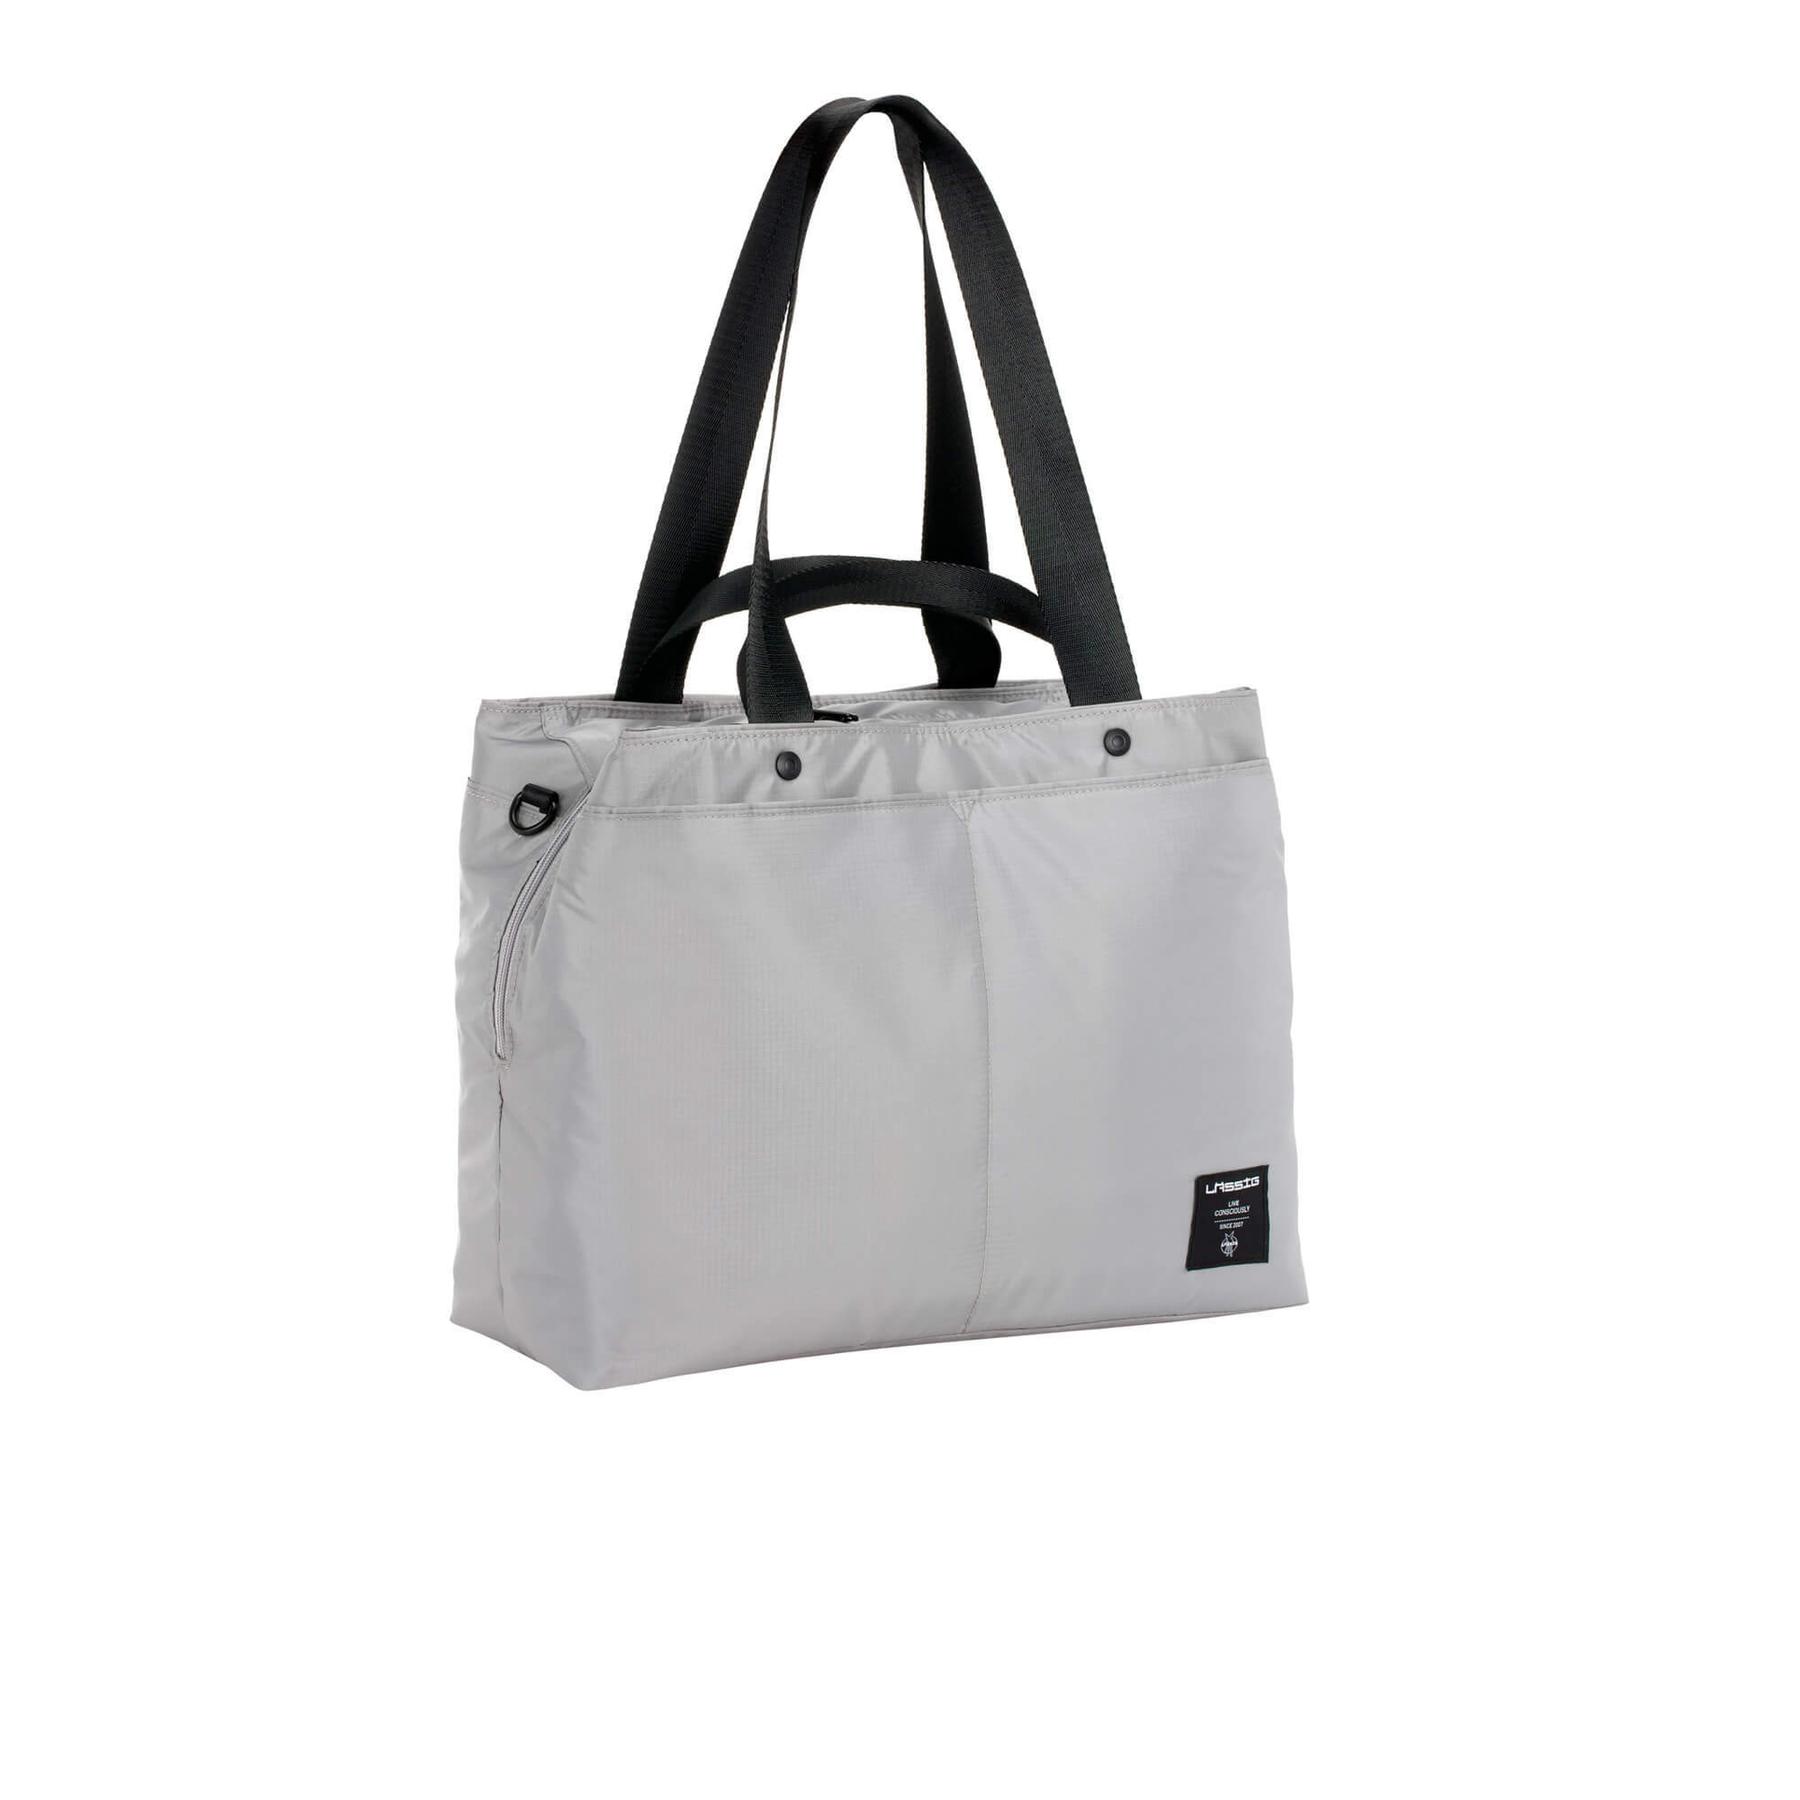 Lässig Green Label Bente Bag